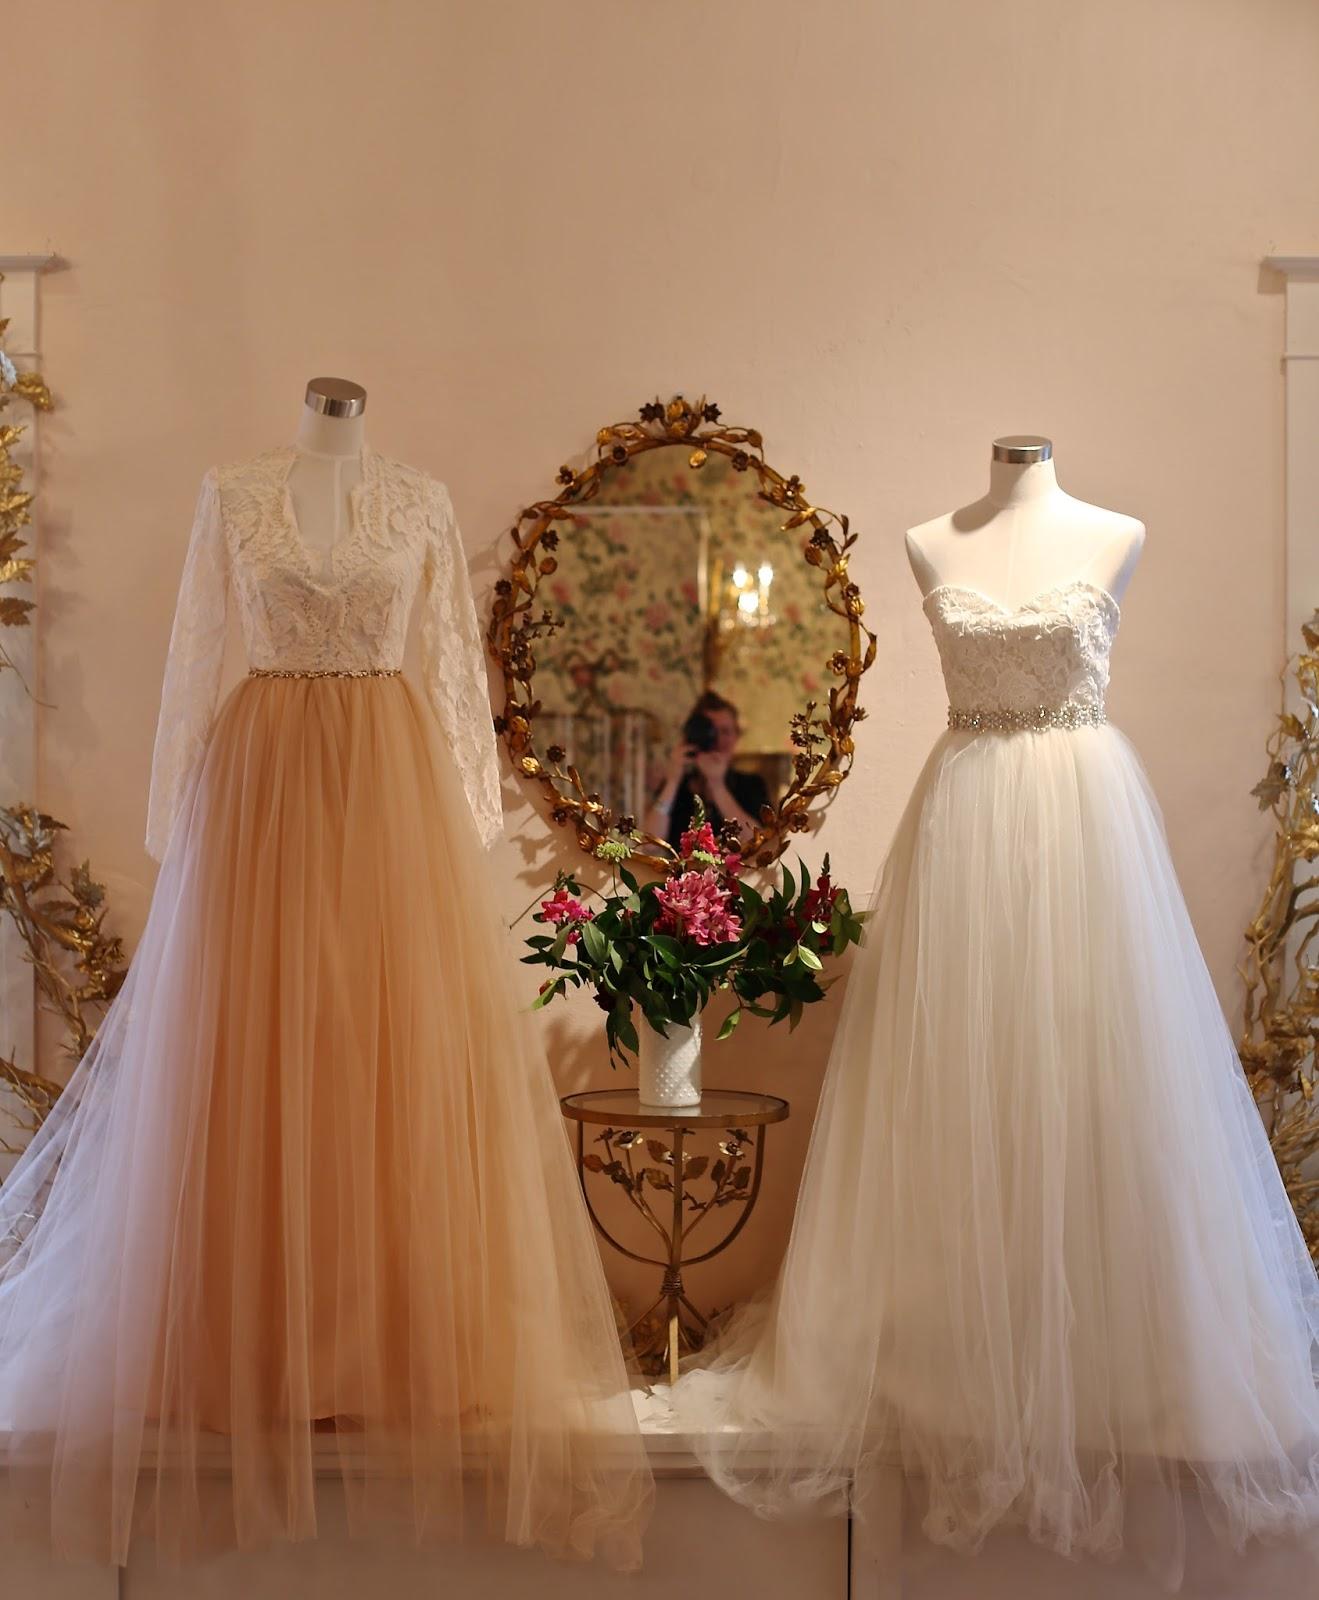 Xtabay Vintage Bridal Salon The English Department